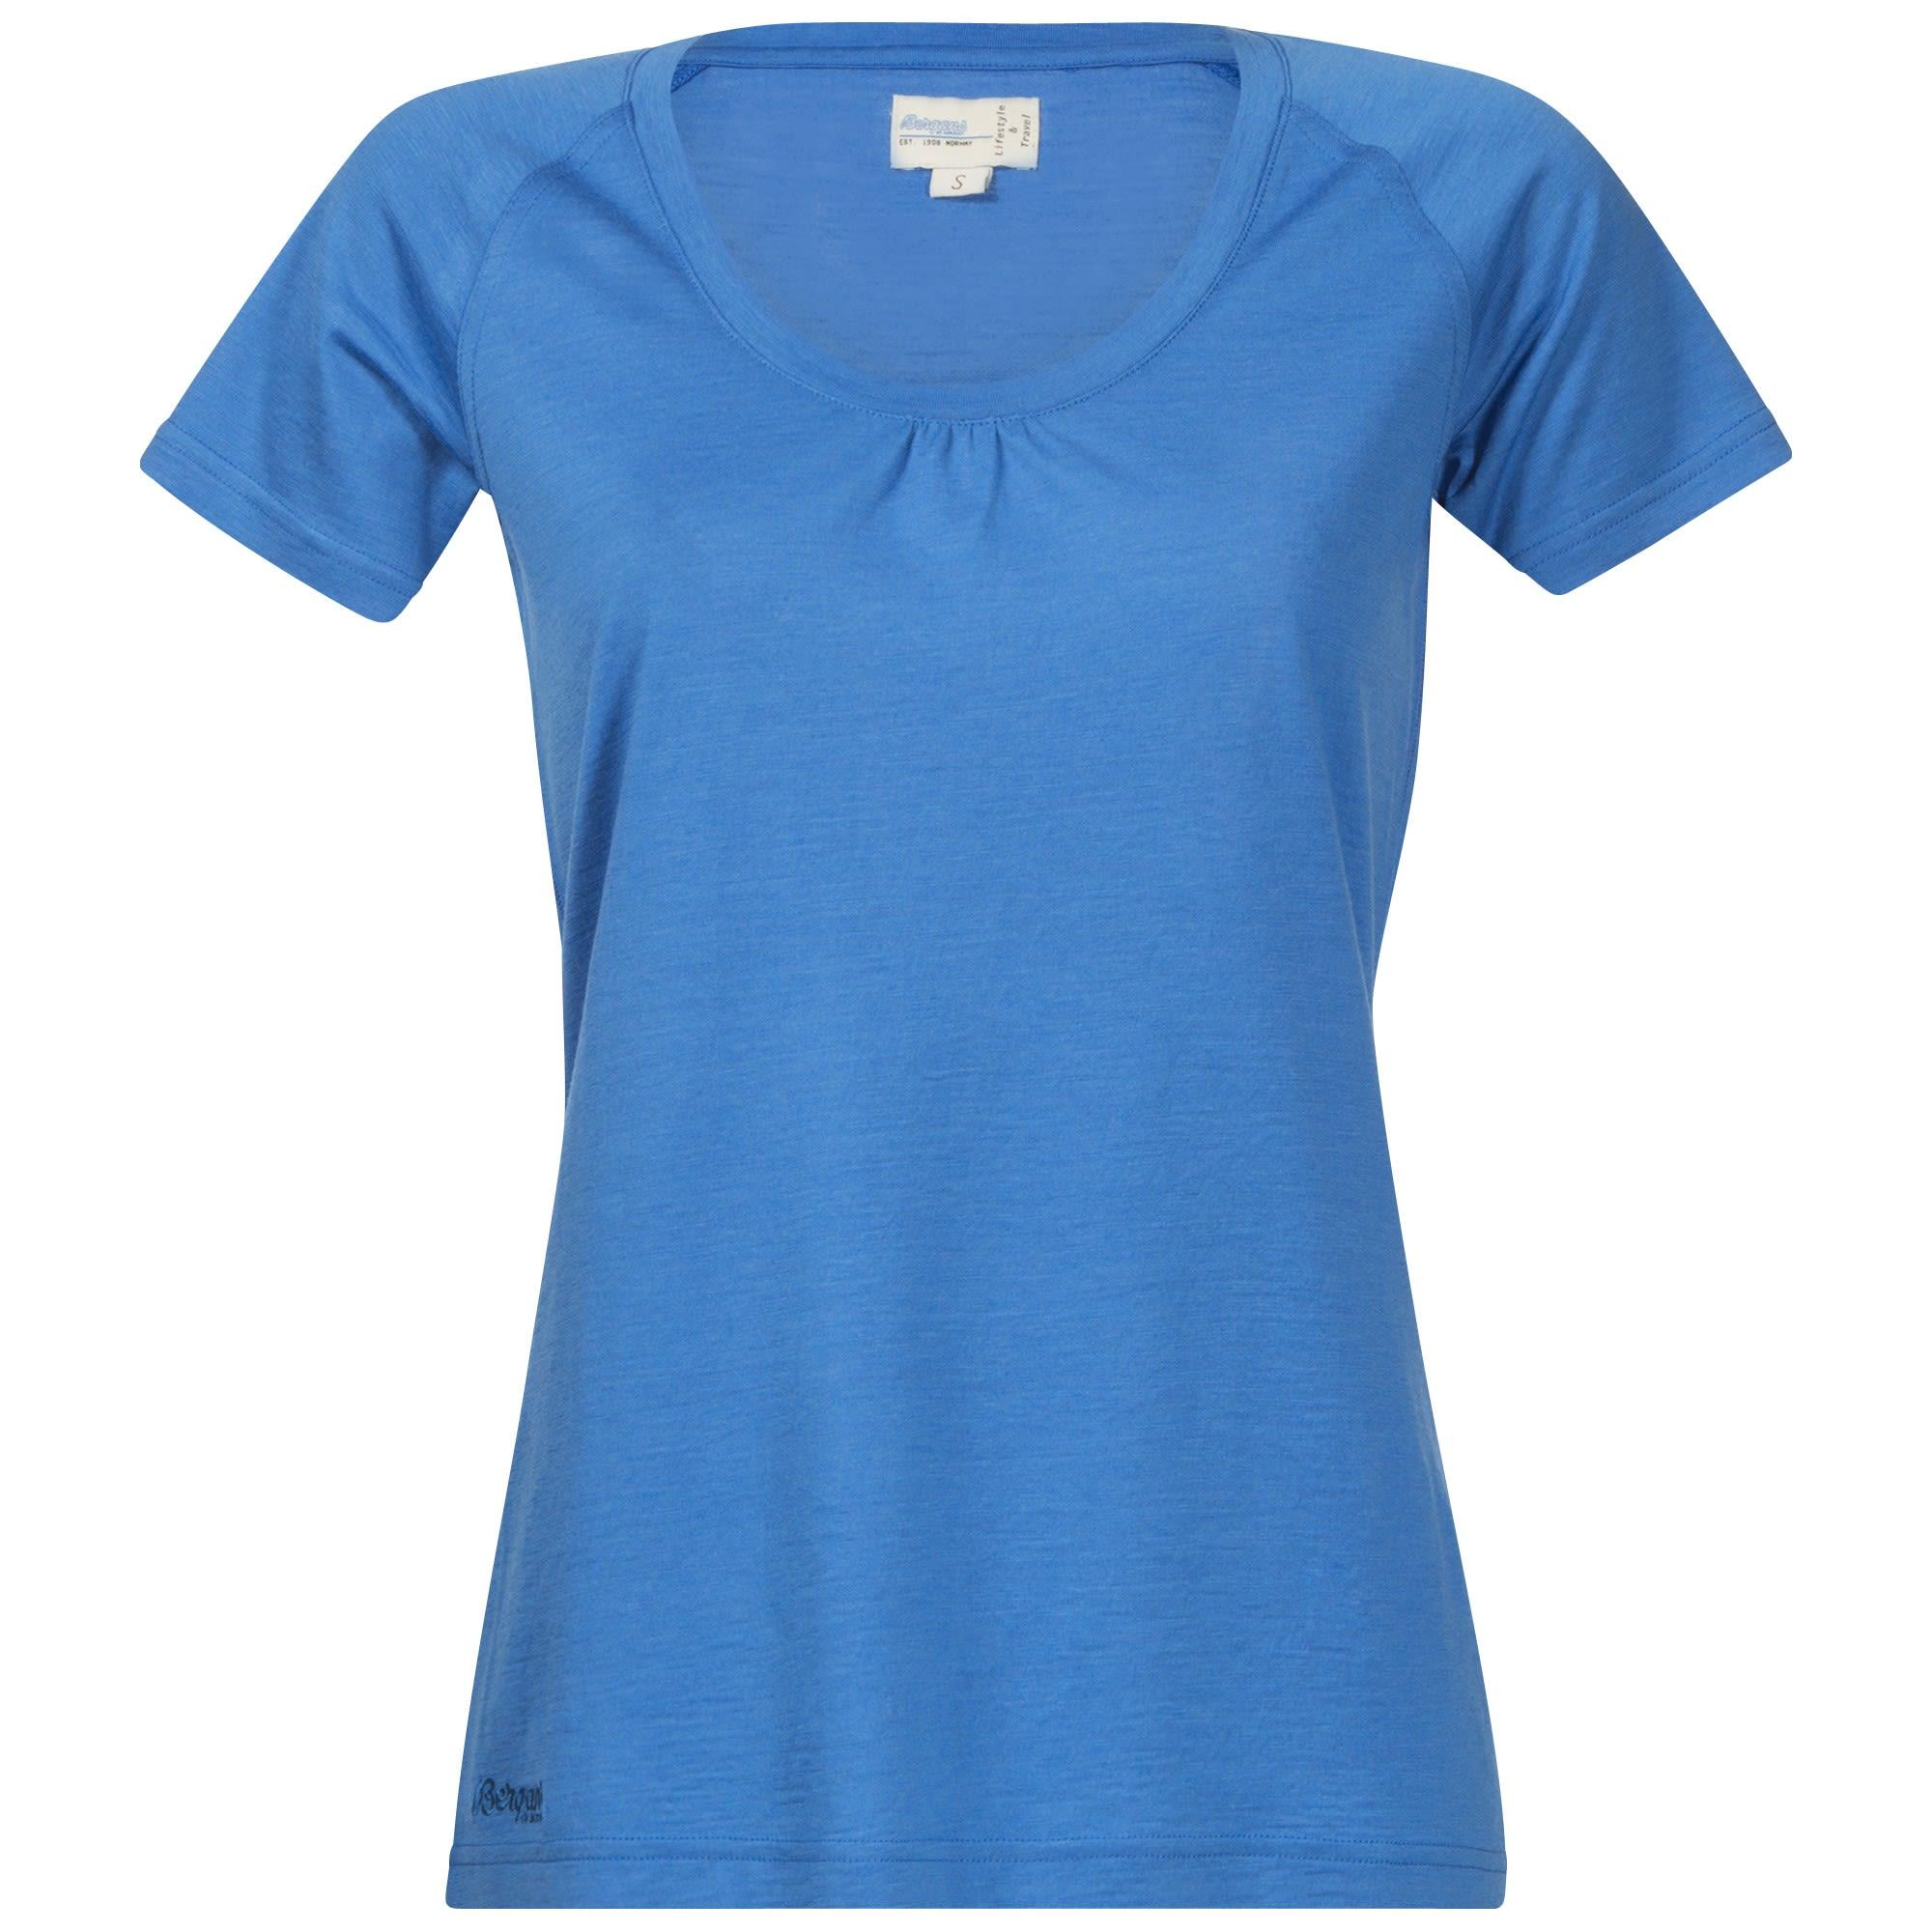 Bergans Sveve Wool Tee Blau, Female Merino Kurzarm-Shirt, L